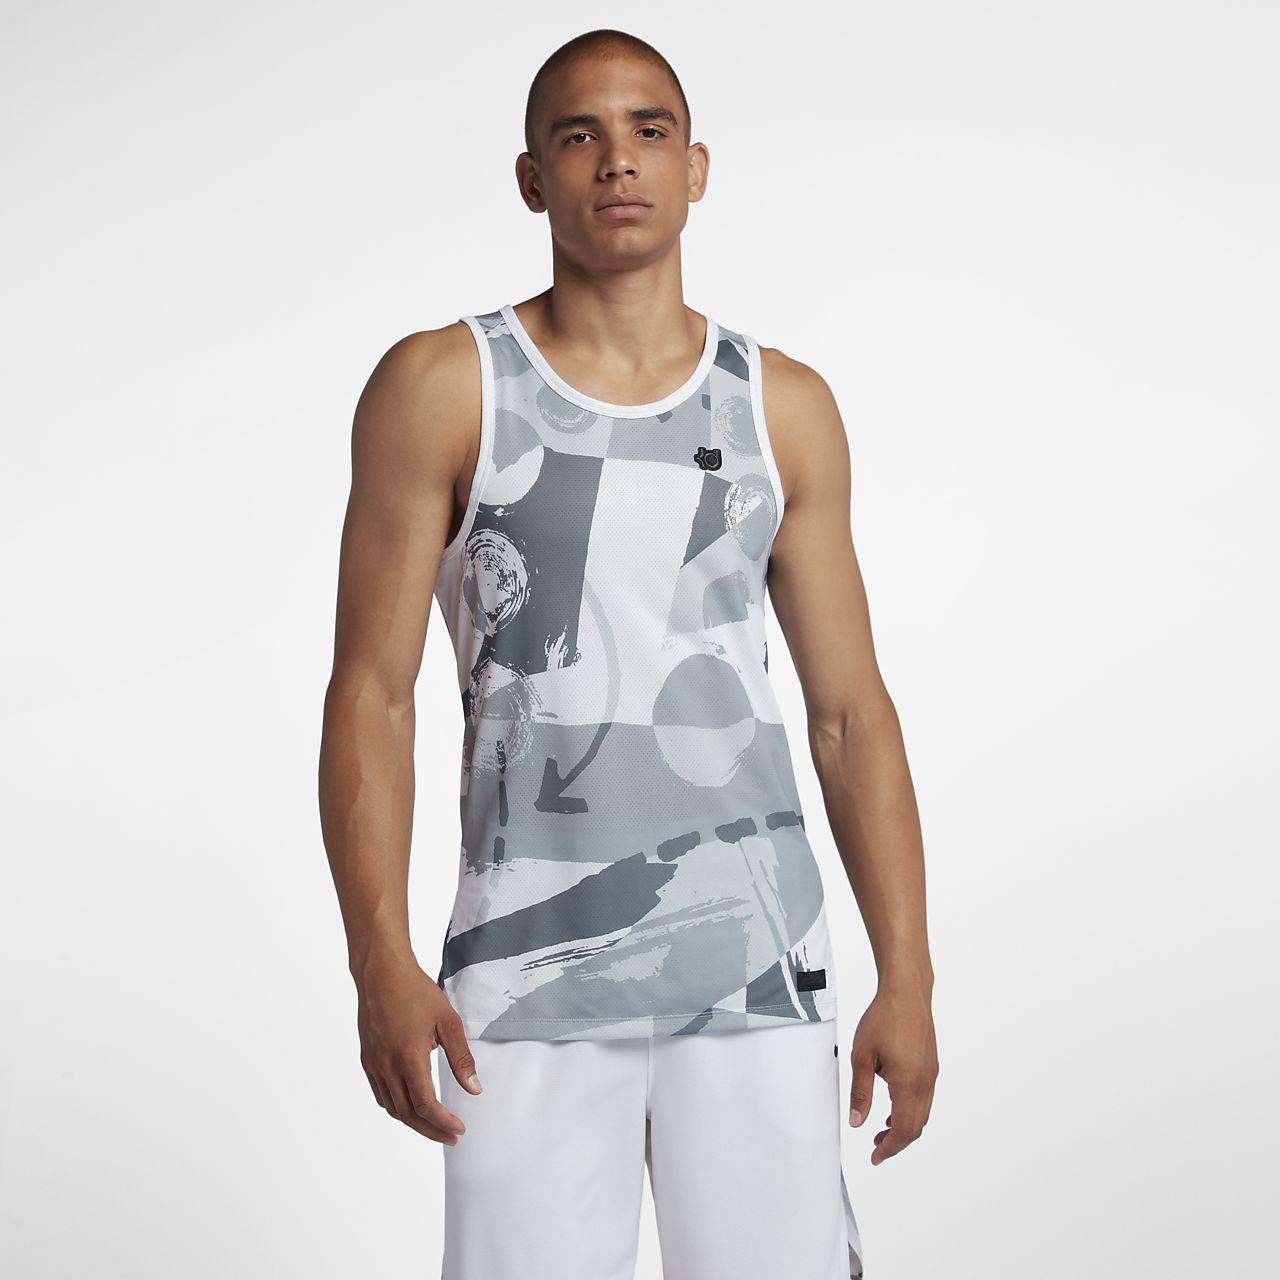 Camisola de basquetebol sem mangas Nike KD Hyper Elite para homem